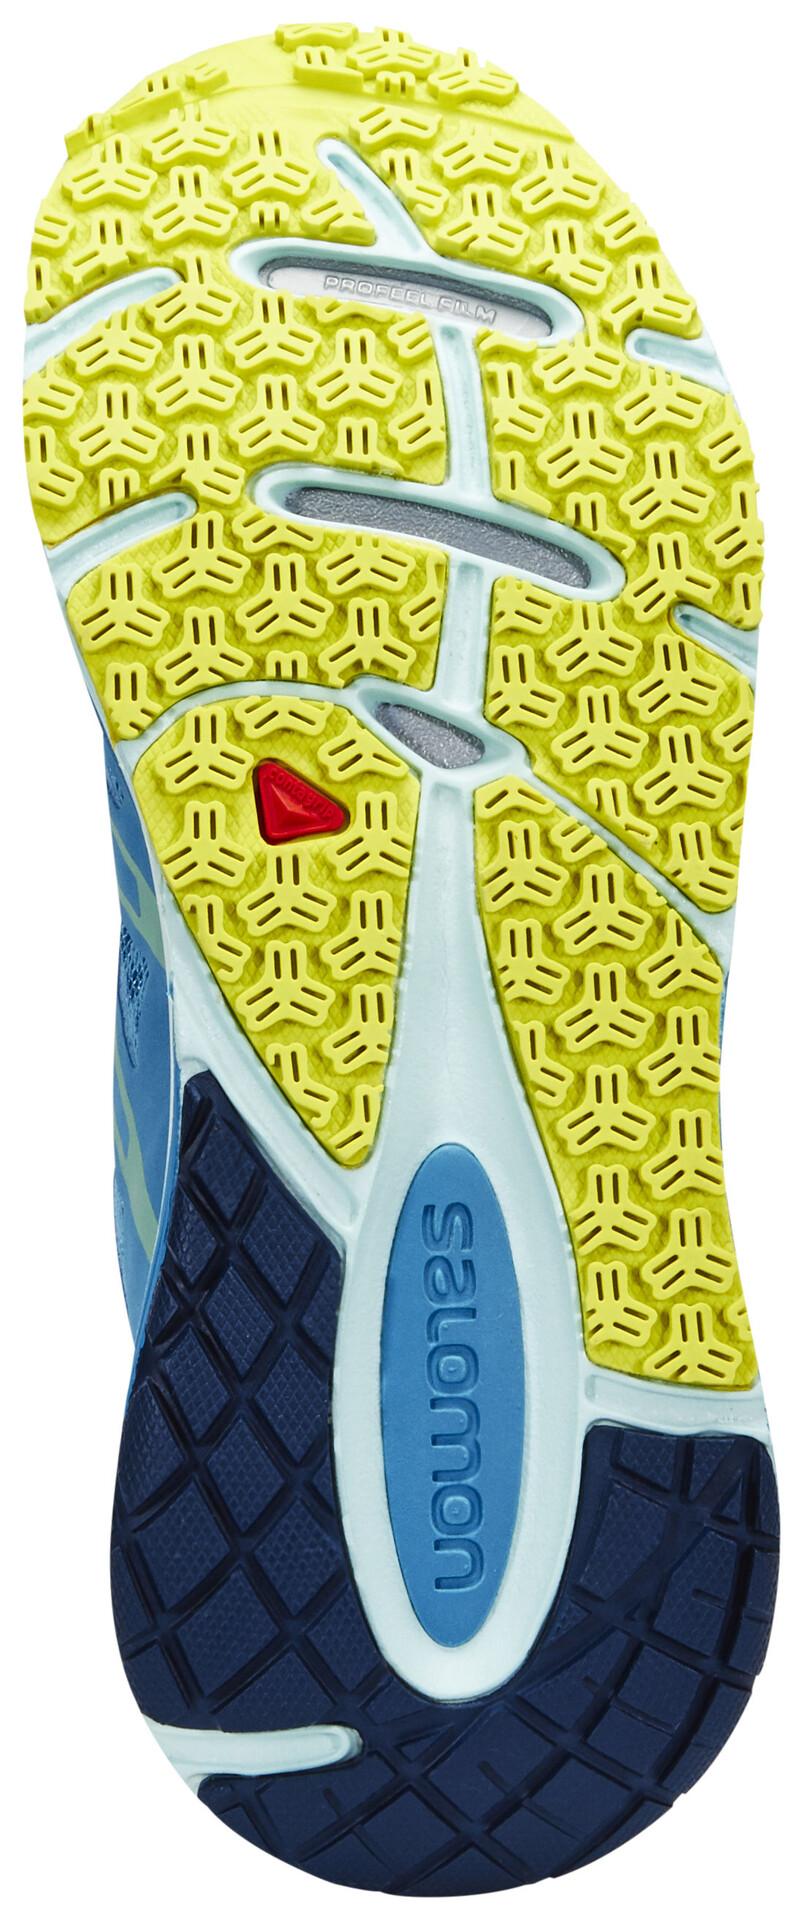 Salomon X Tour 2 Trailrunning Schuhe Damen mist blueslatebluegecko green